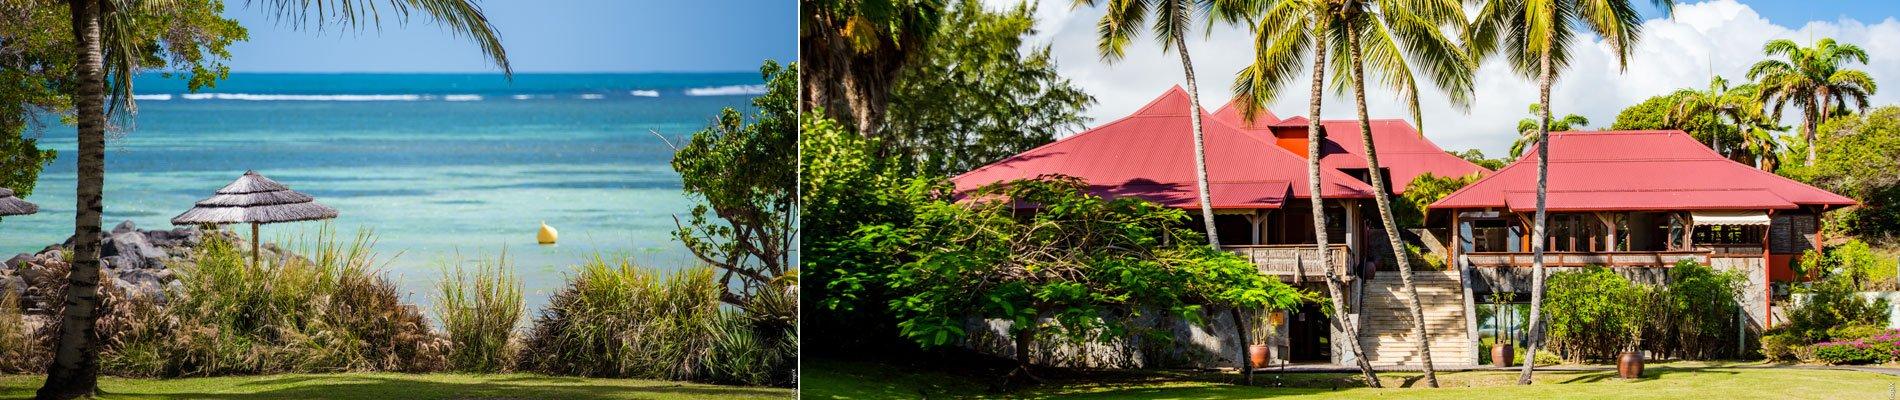 -cap-est-lagoon-resort-en-spa-martinique-2017